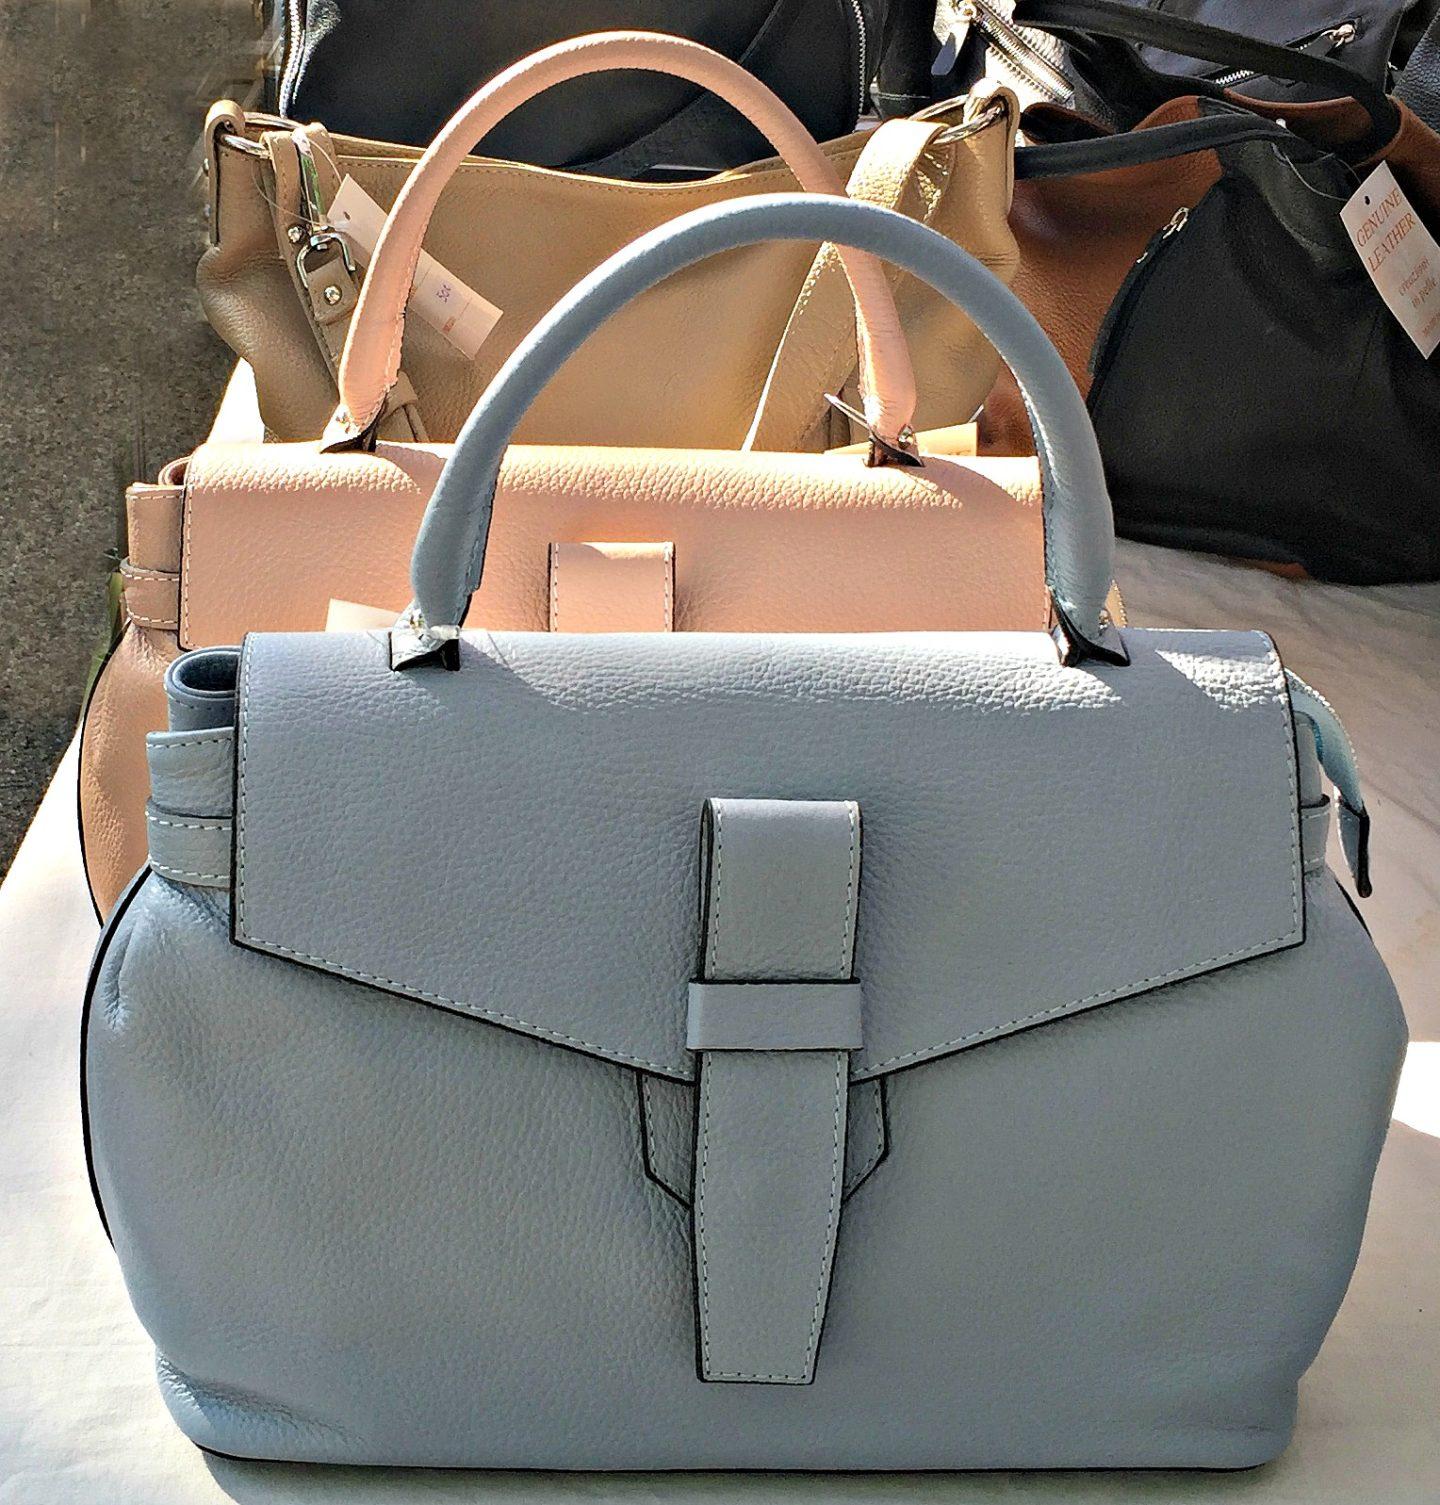 Pastel coloured handbags